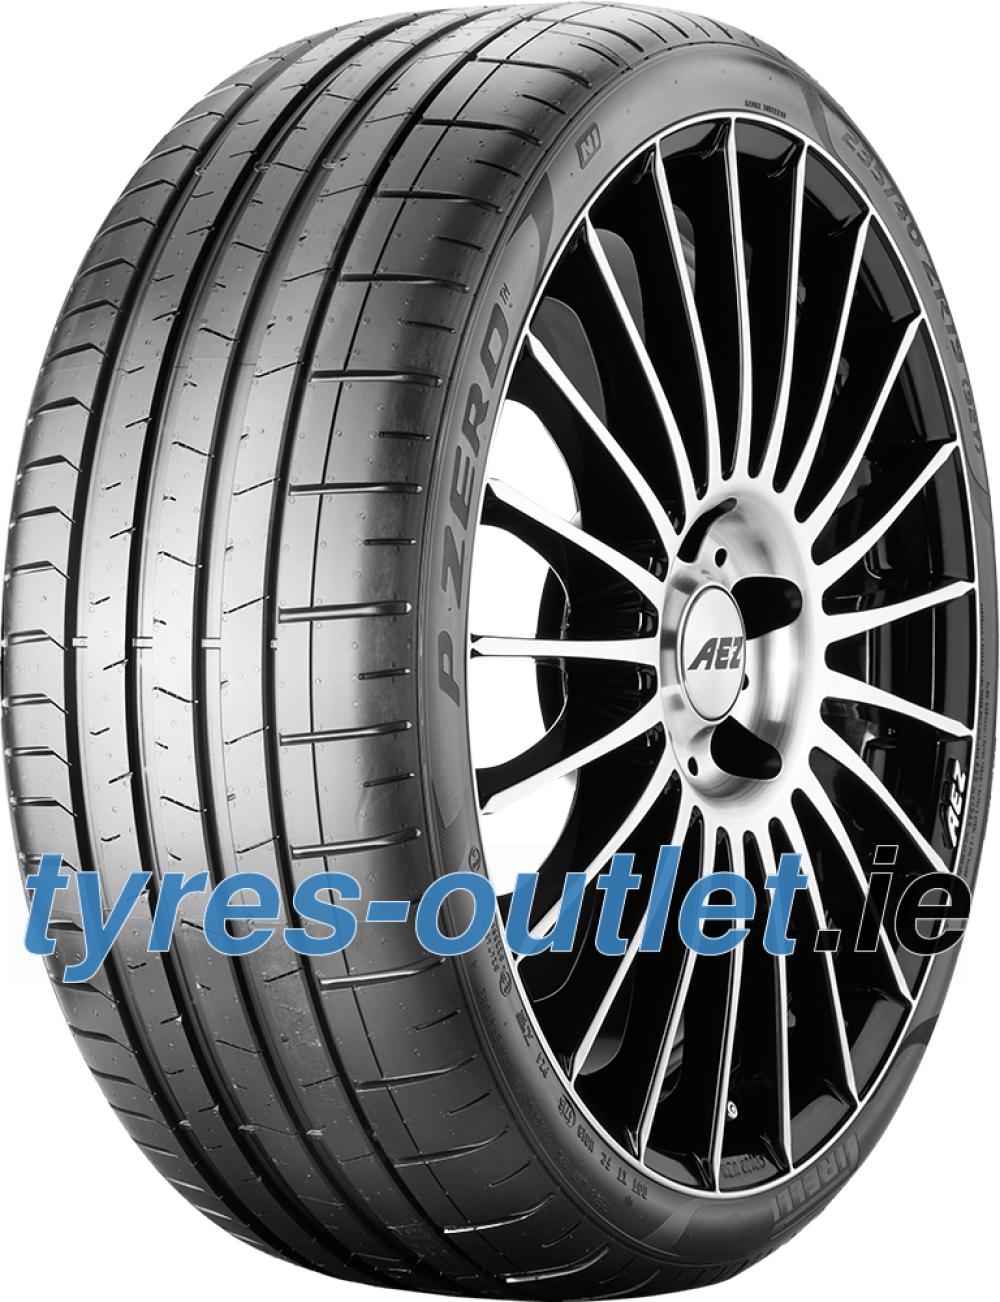 Pirelli P Zero SC ( 245/35 ZR20 95Y XL F01 )